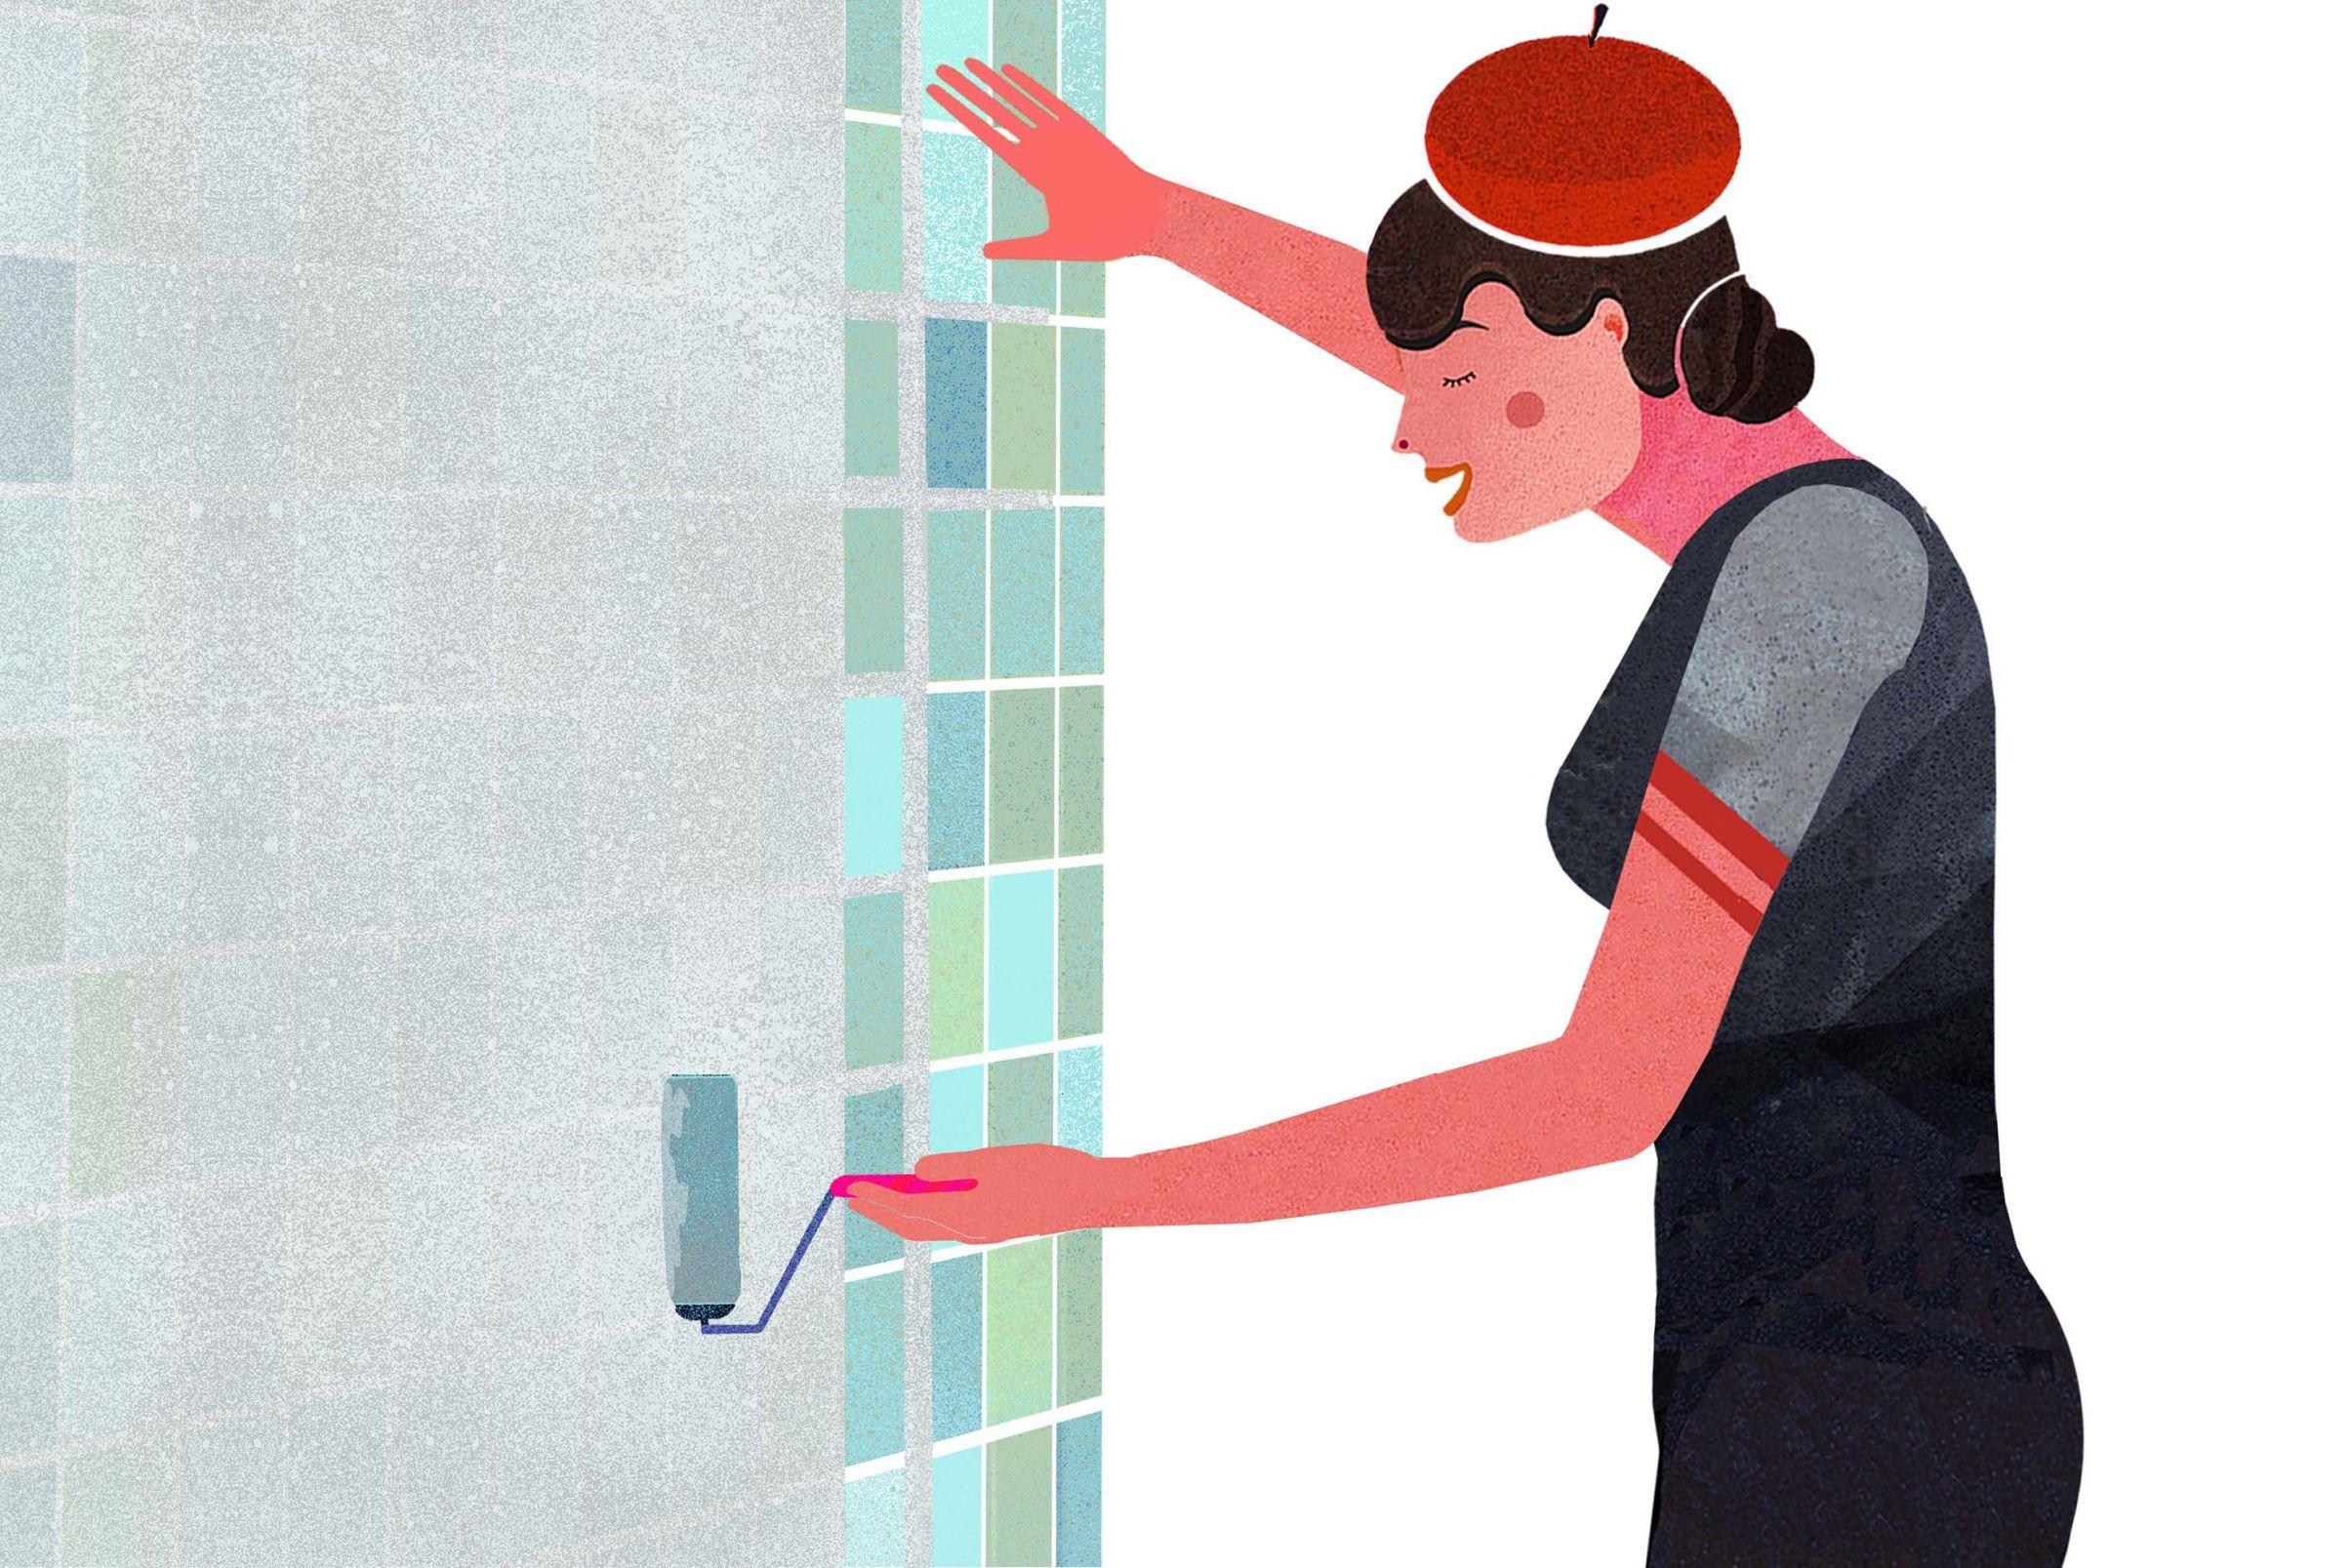 Como-empapelar-cuartos-de-bano-Aplicar-imprimacion-de-penetracion-profunda-dos-veces